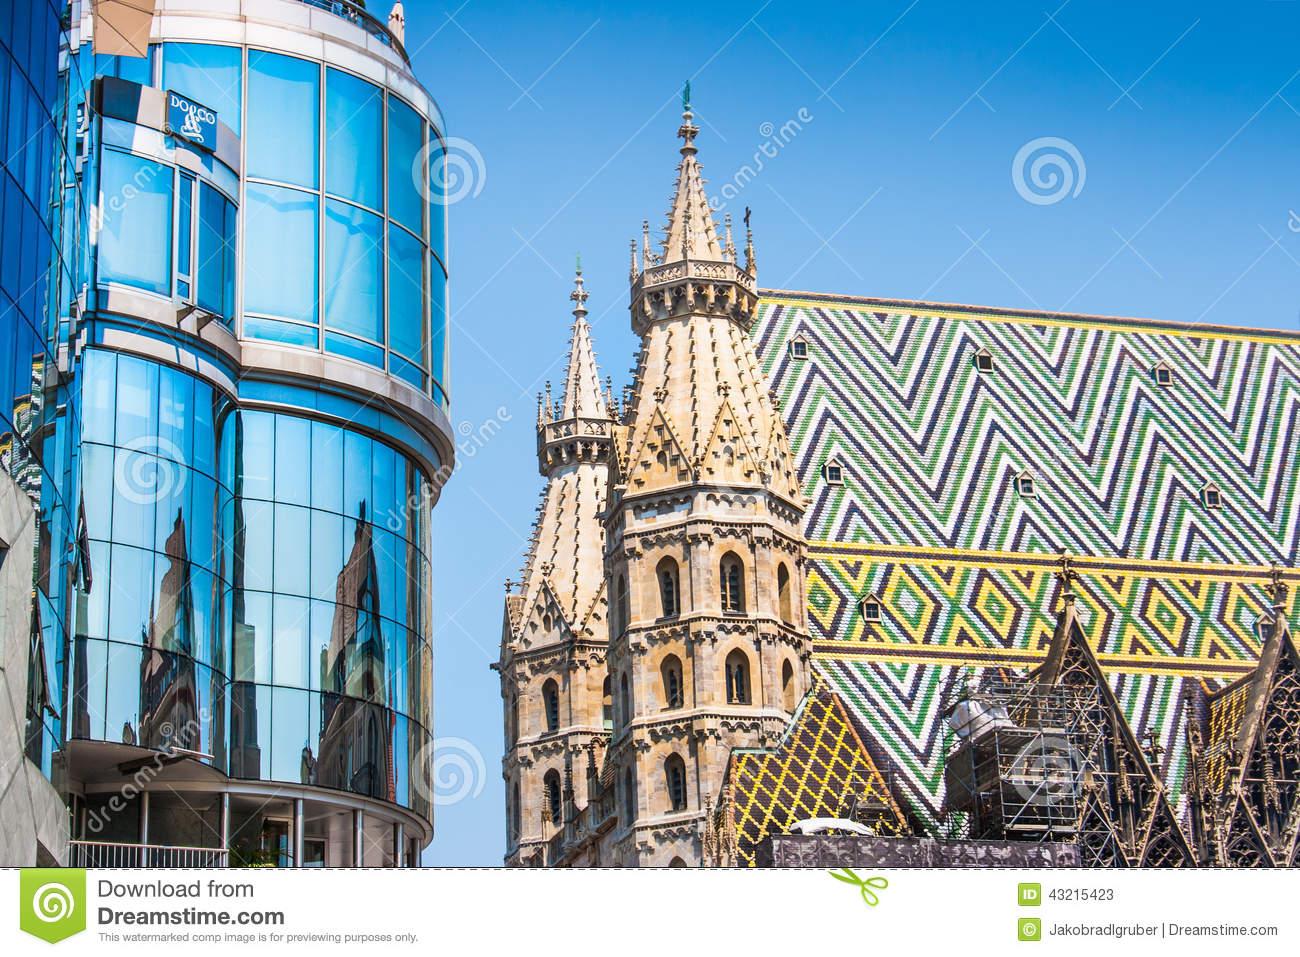 St. Stephen's Cathedral, Vienna, Austria Stock Photo.